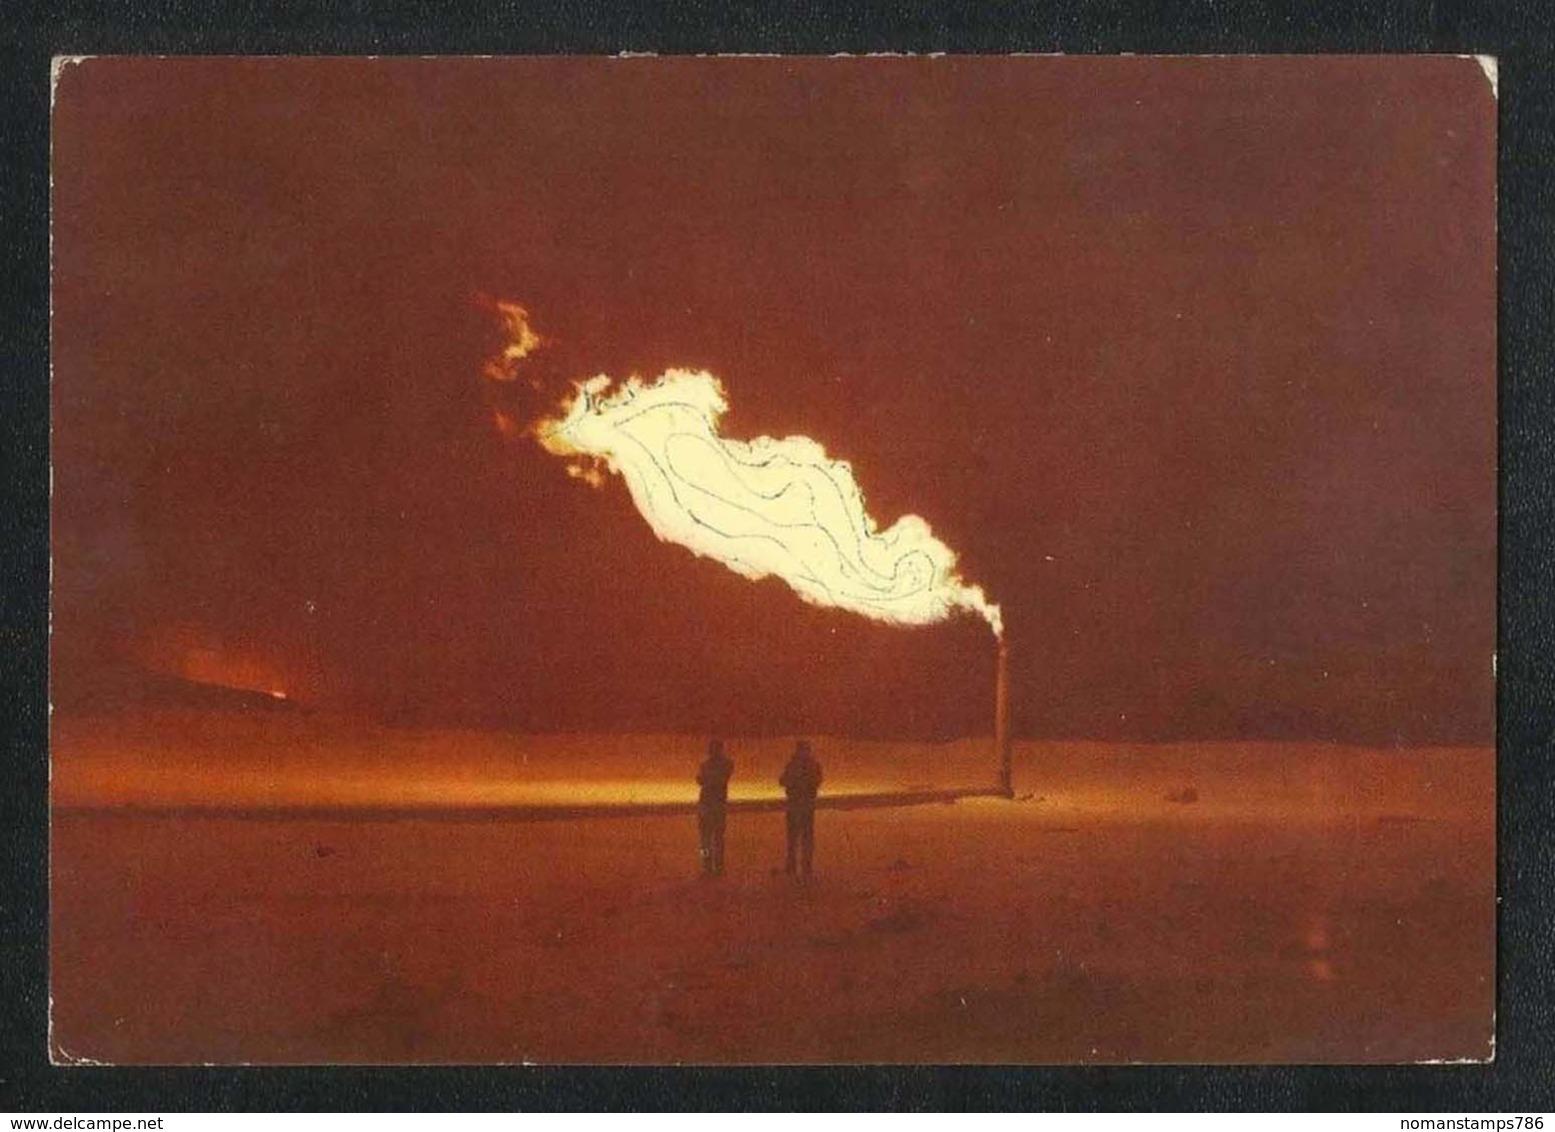 Qatar Picture Postcard Gas Flare In The Oil Field Qatar View Card - Qatar